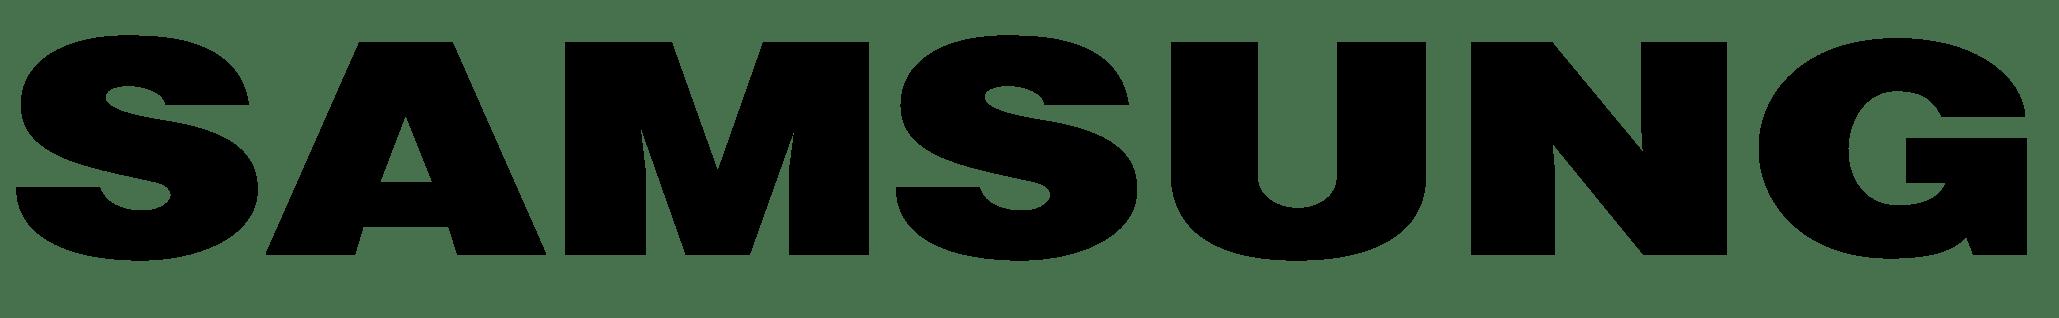 Samsung Authorised Service Center